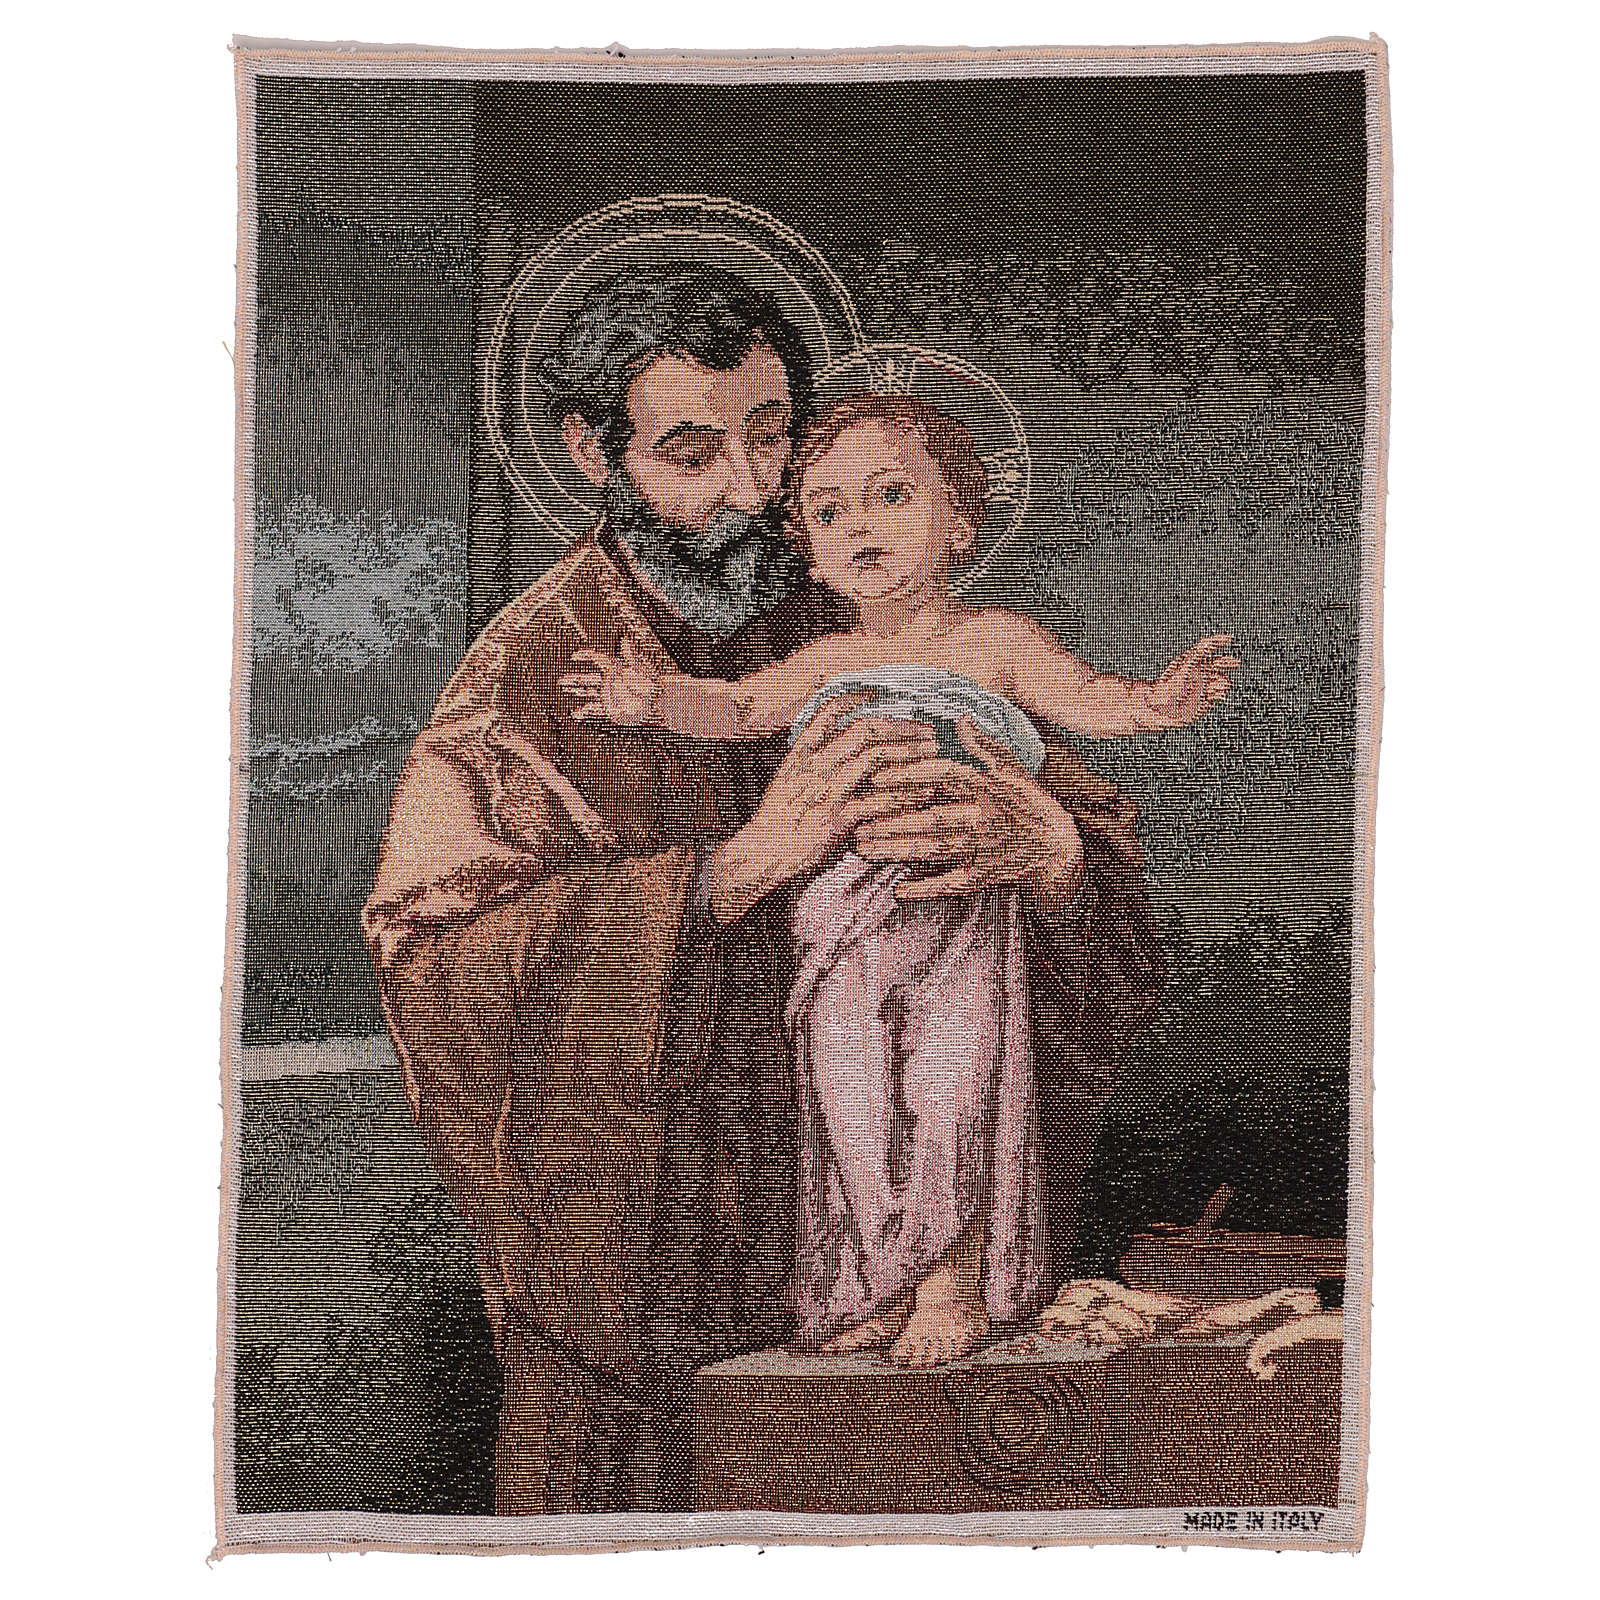 Wandteppich Heiliger Josef modern 50x40 cm 3